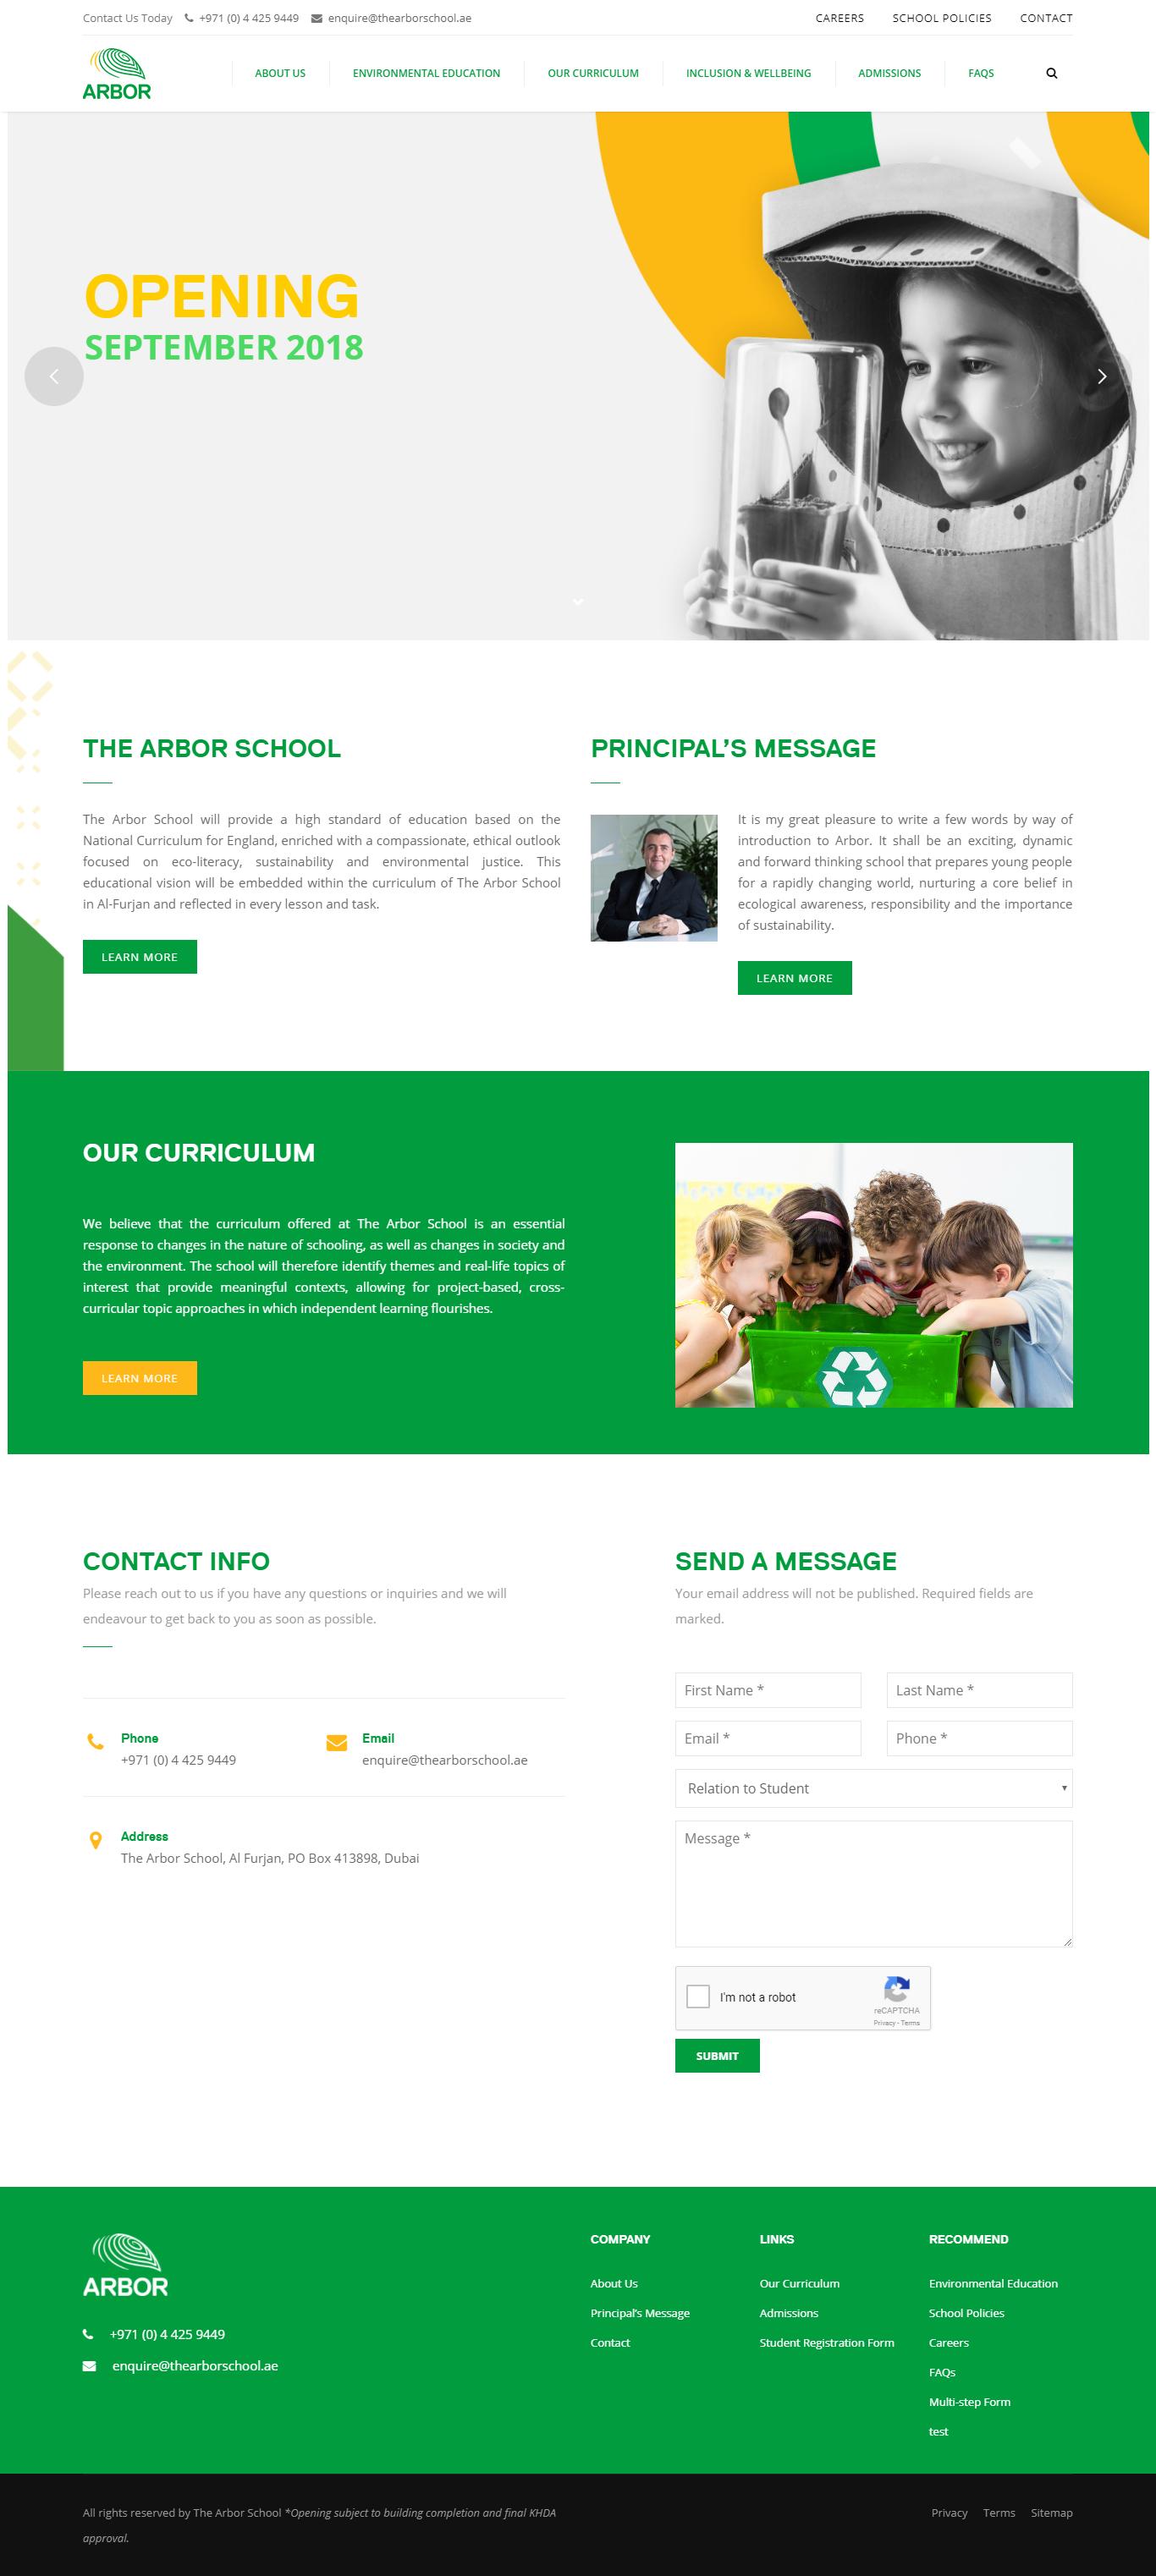 The Arbor School Website by Nexa, Dubai.png